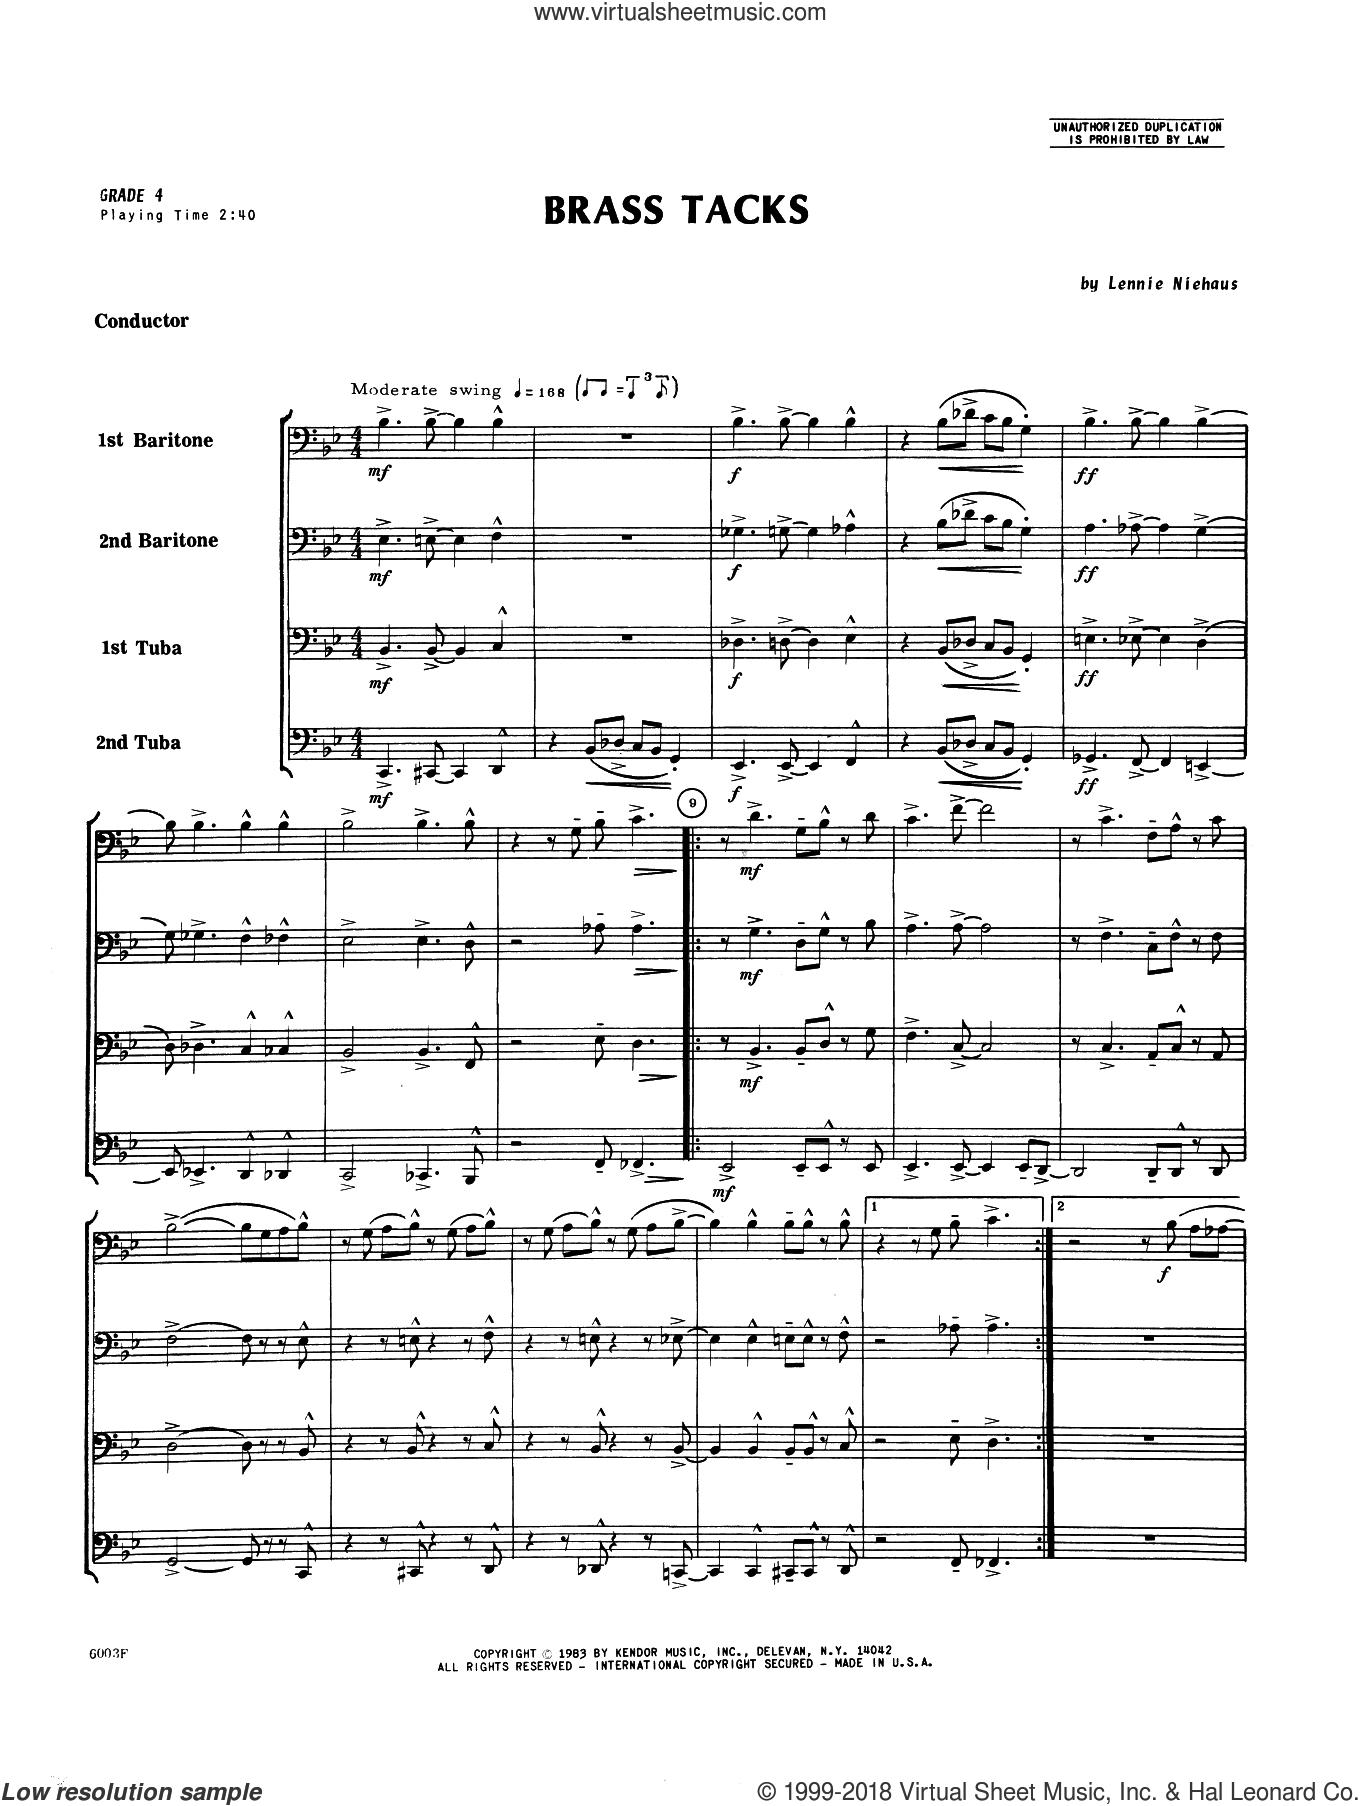 Brass Tacks (COMPLETE) sheet music for brass quartet by Lennie Niehaus, intermediate skill level